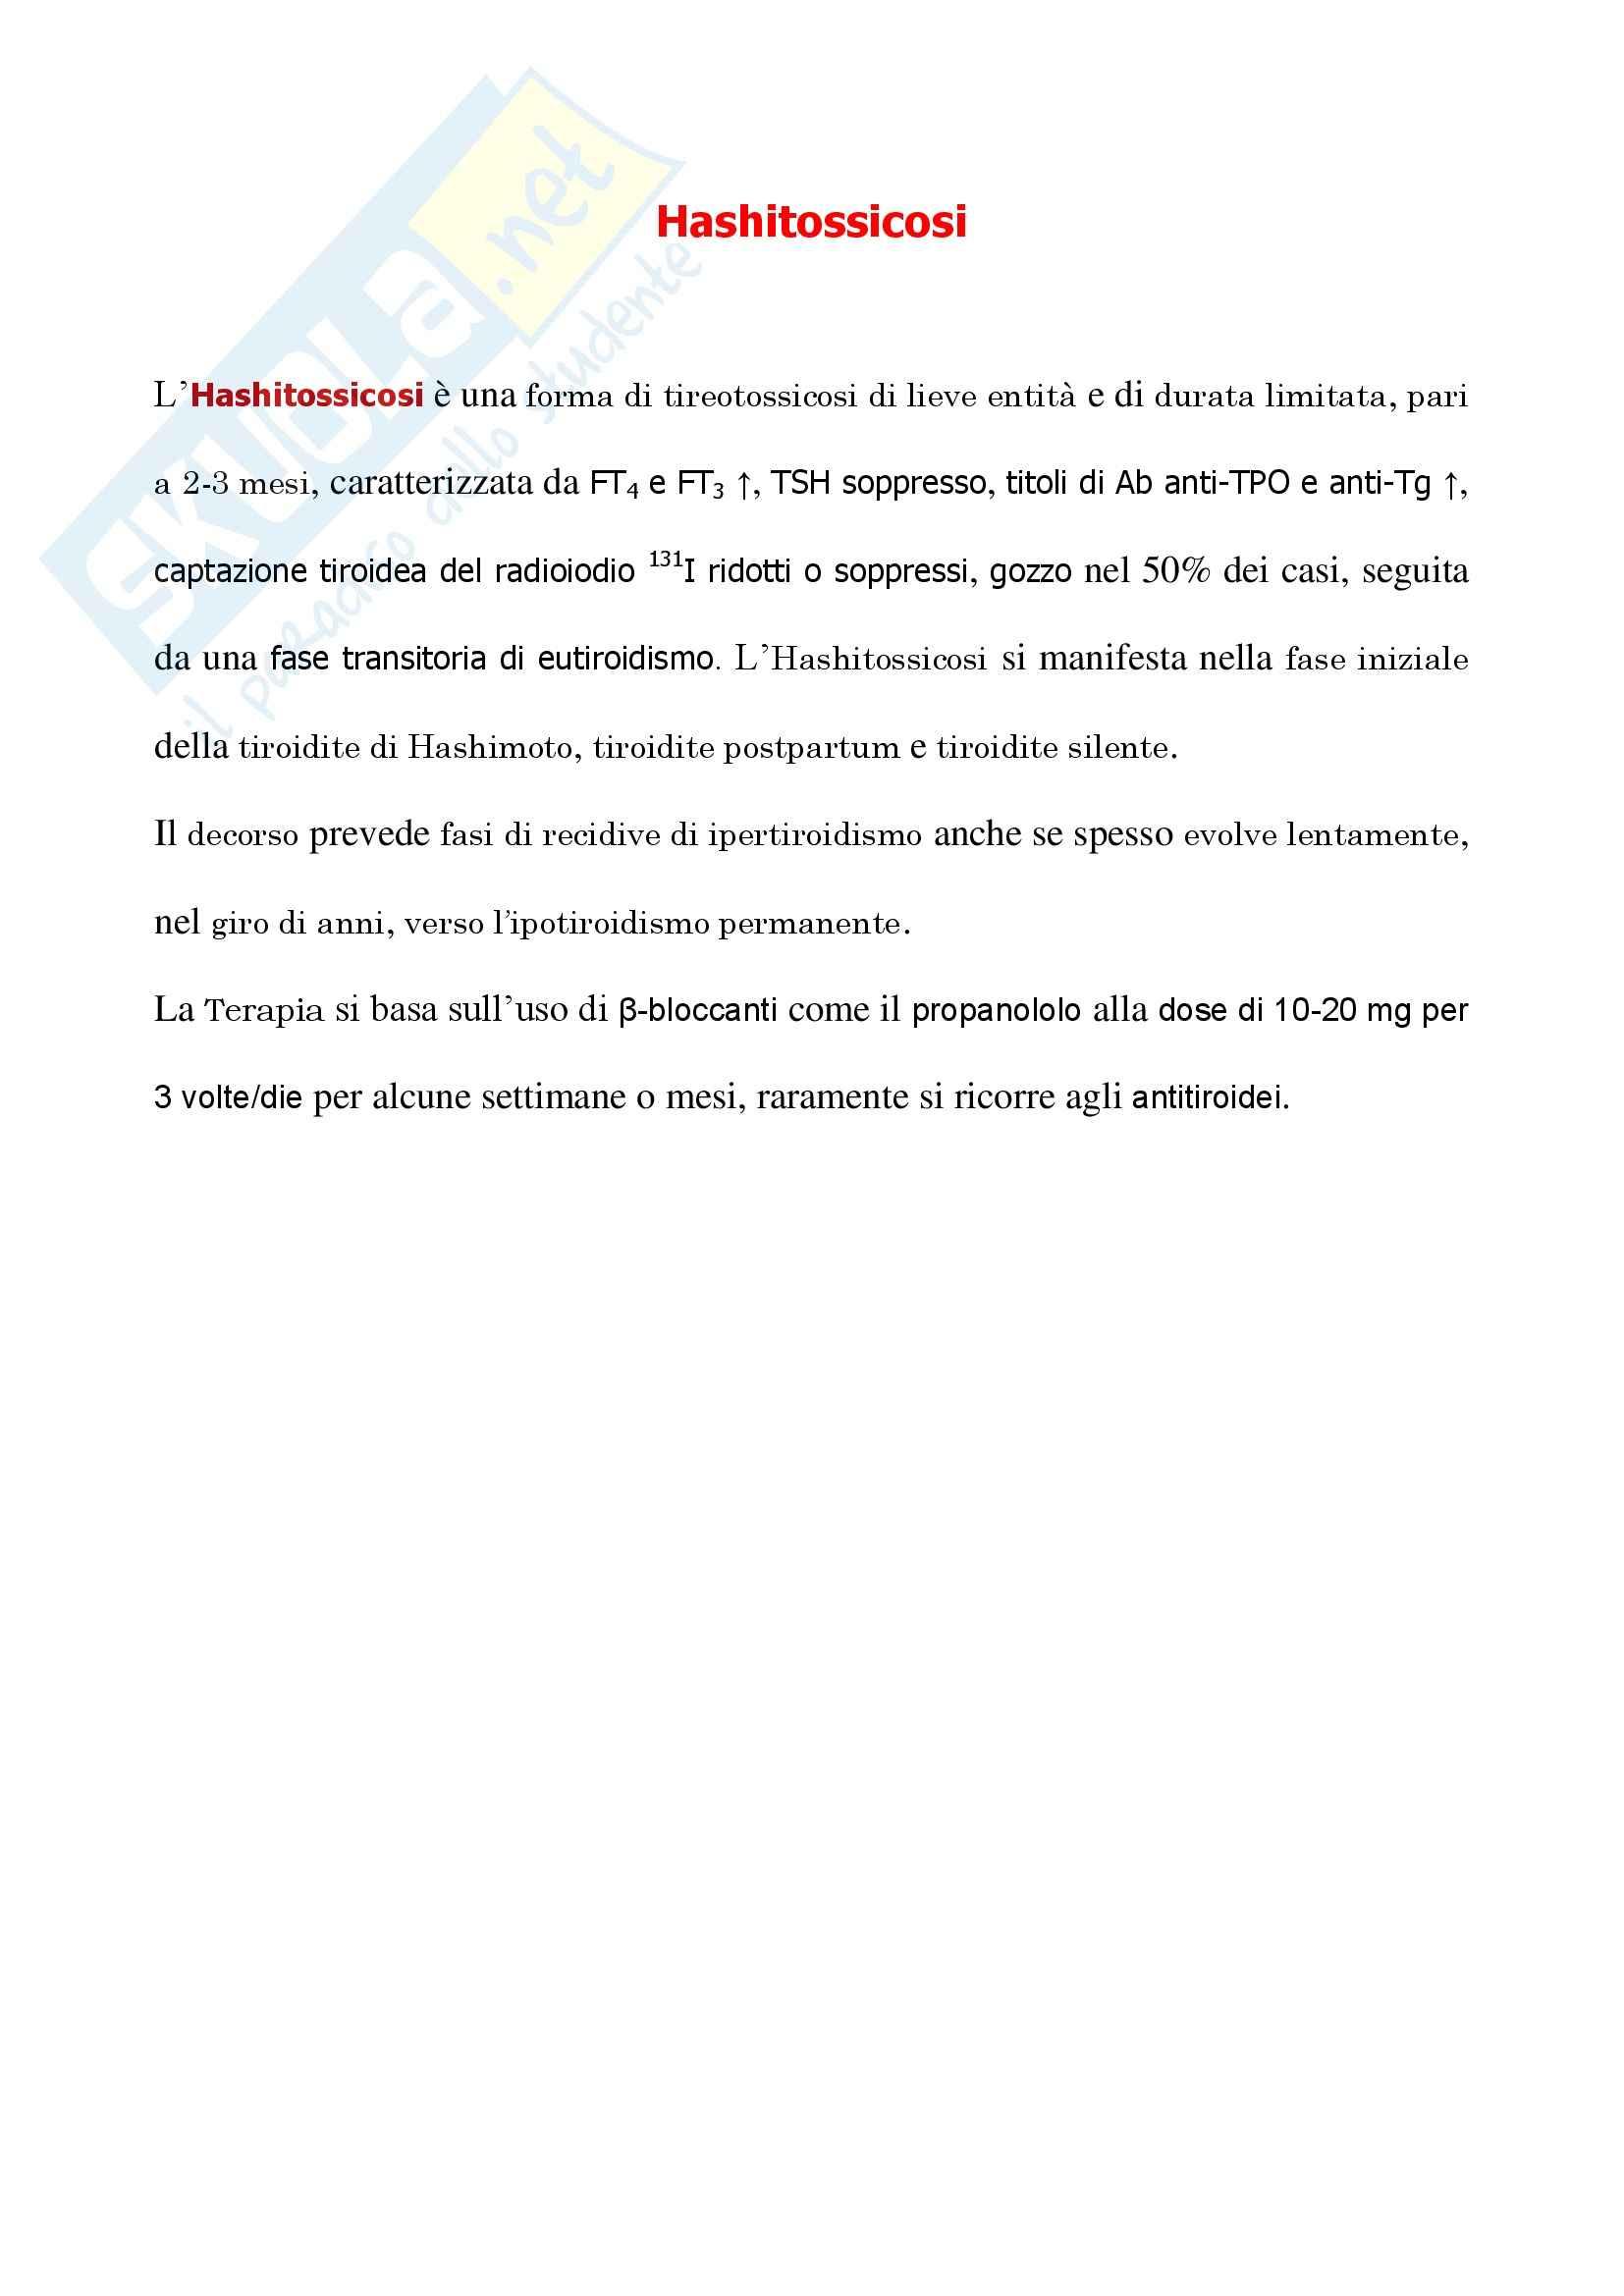 Endocrinologia - hashitossicosi